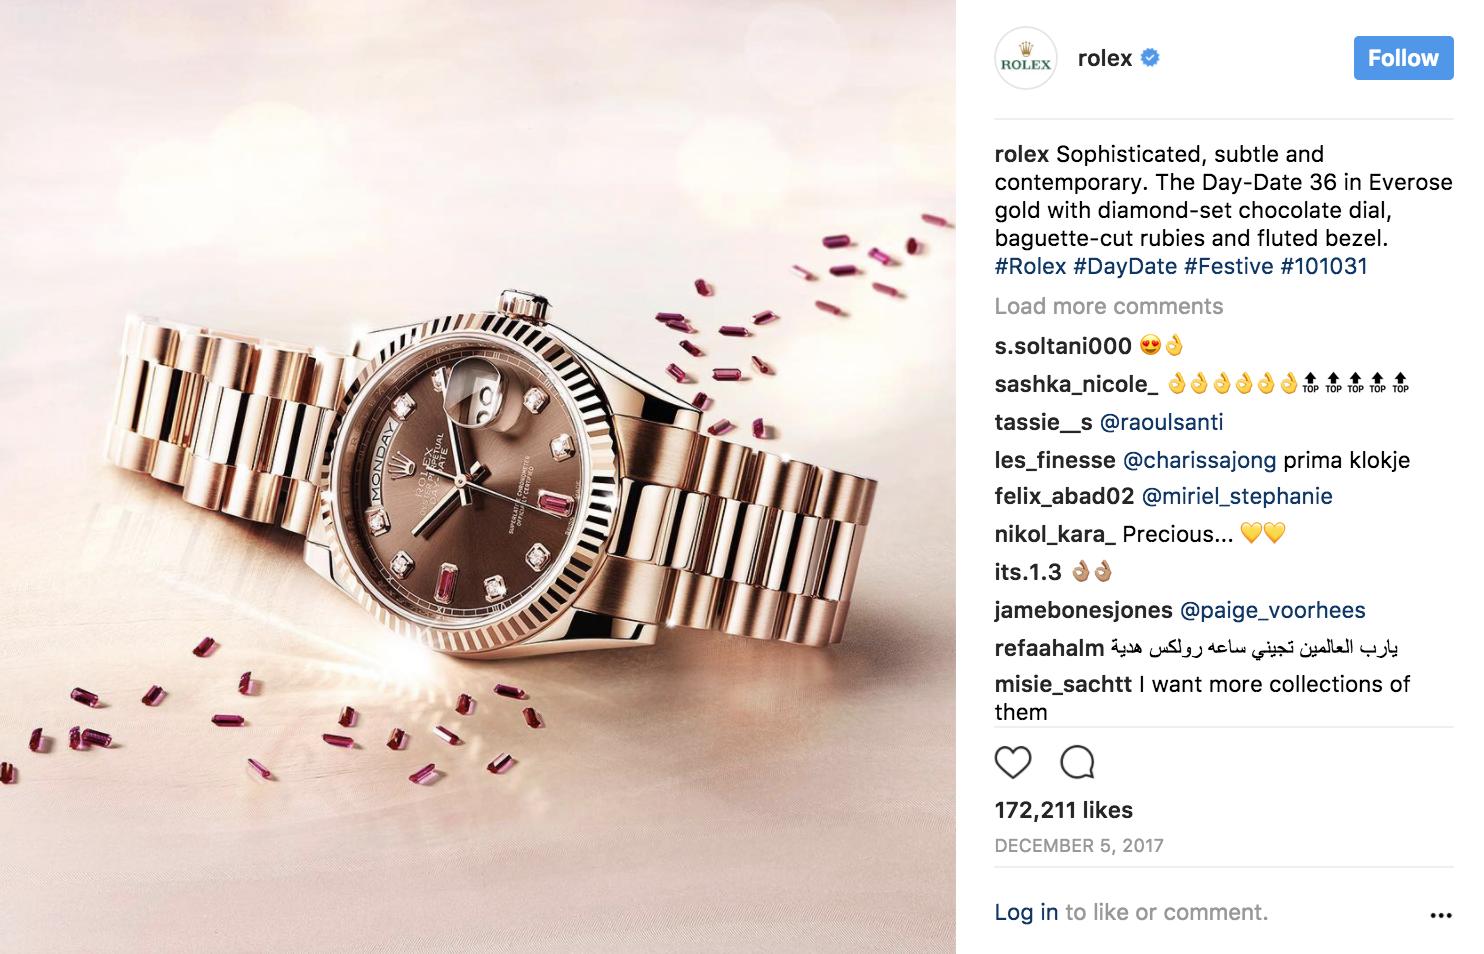 rolex-content-marketing-examples